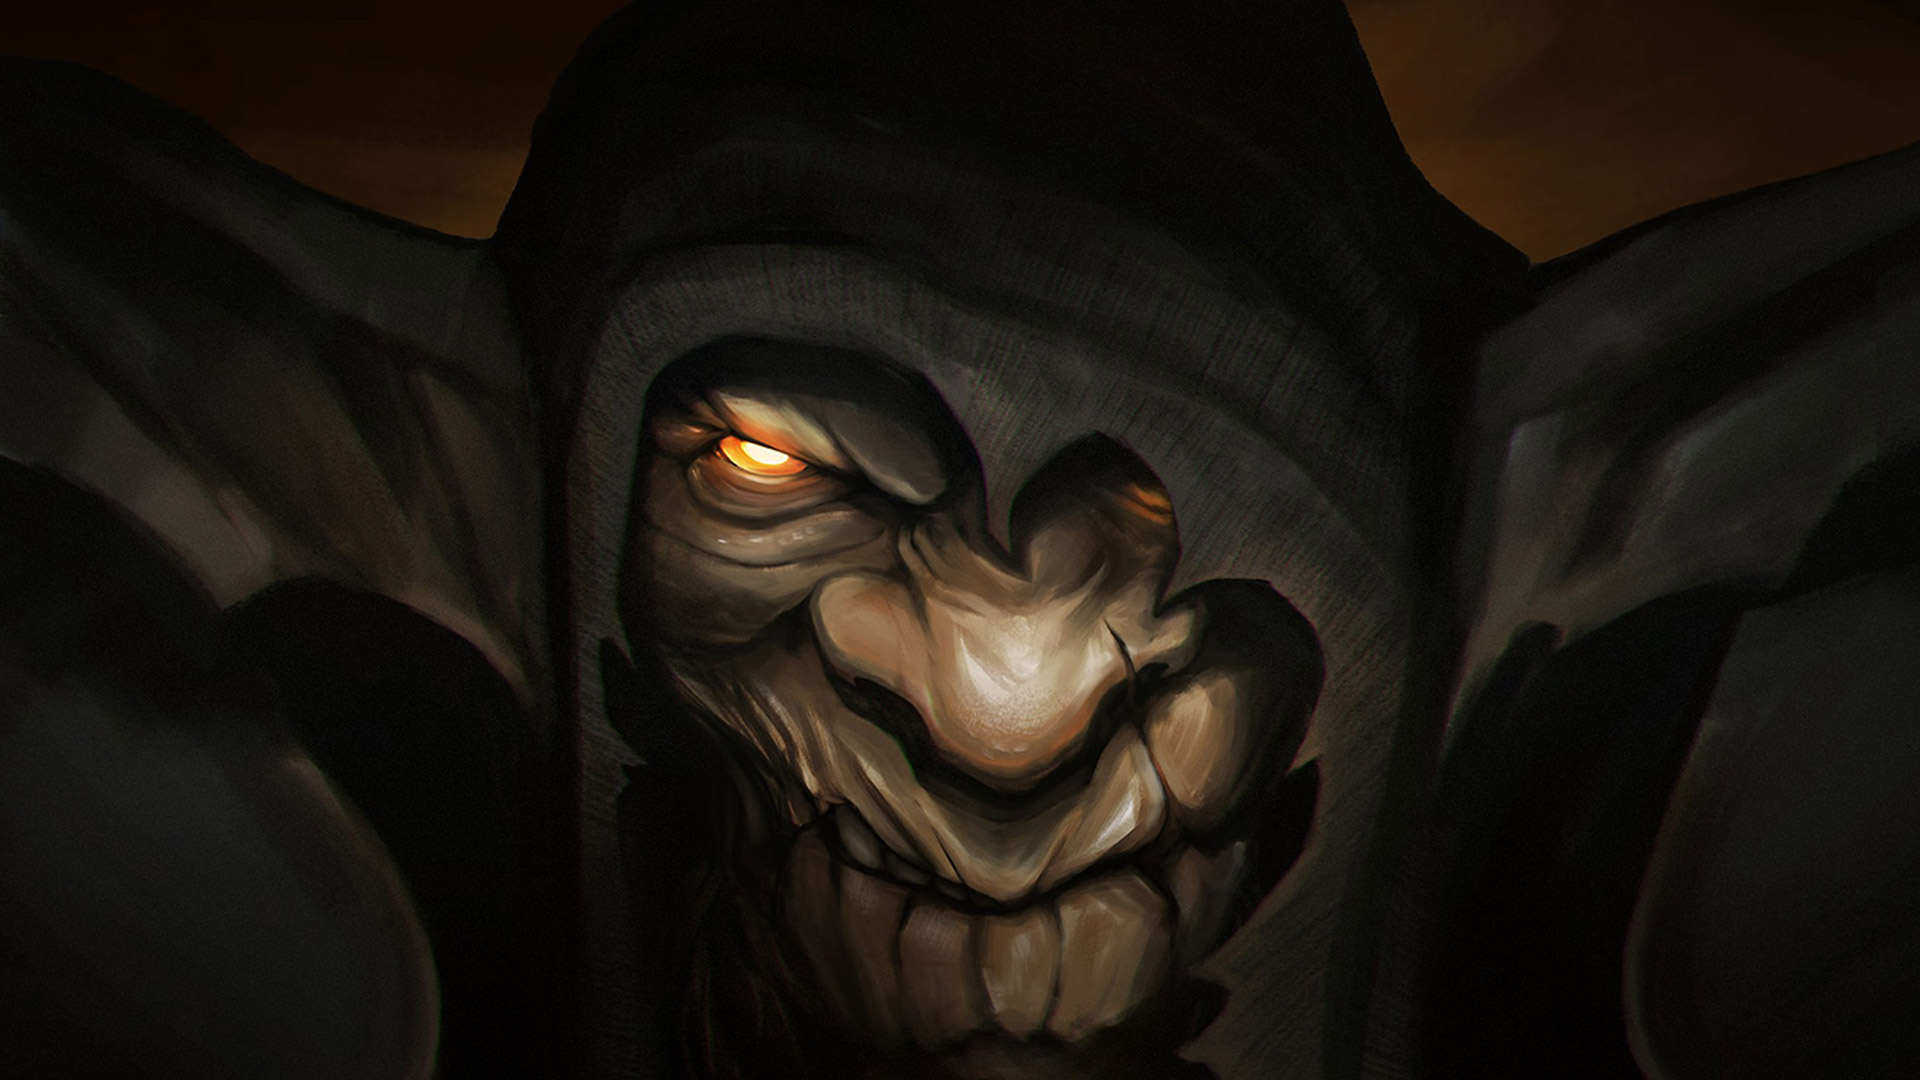 Styx Master of Shadows Wallpaper in 1920x1080 1920x1080